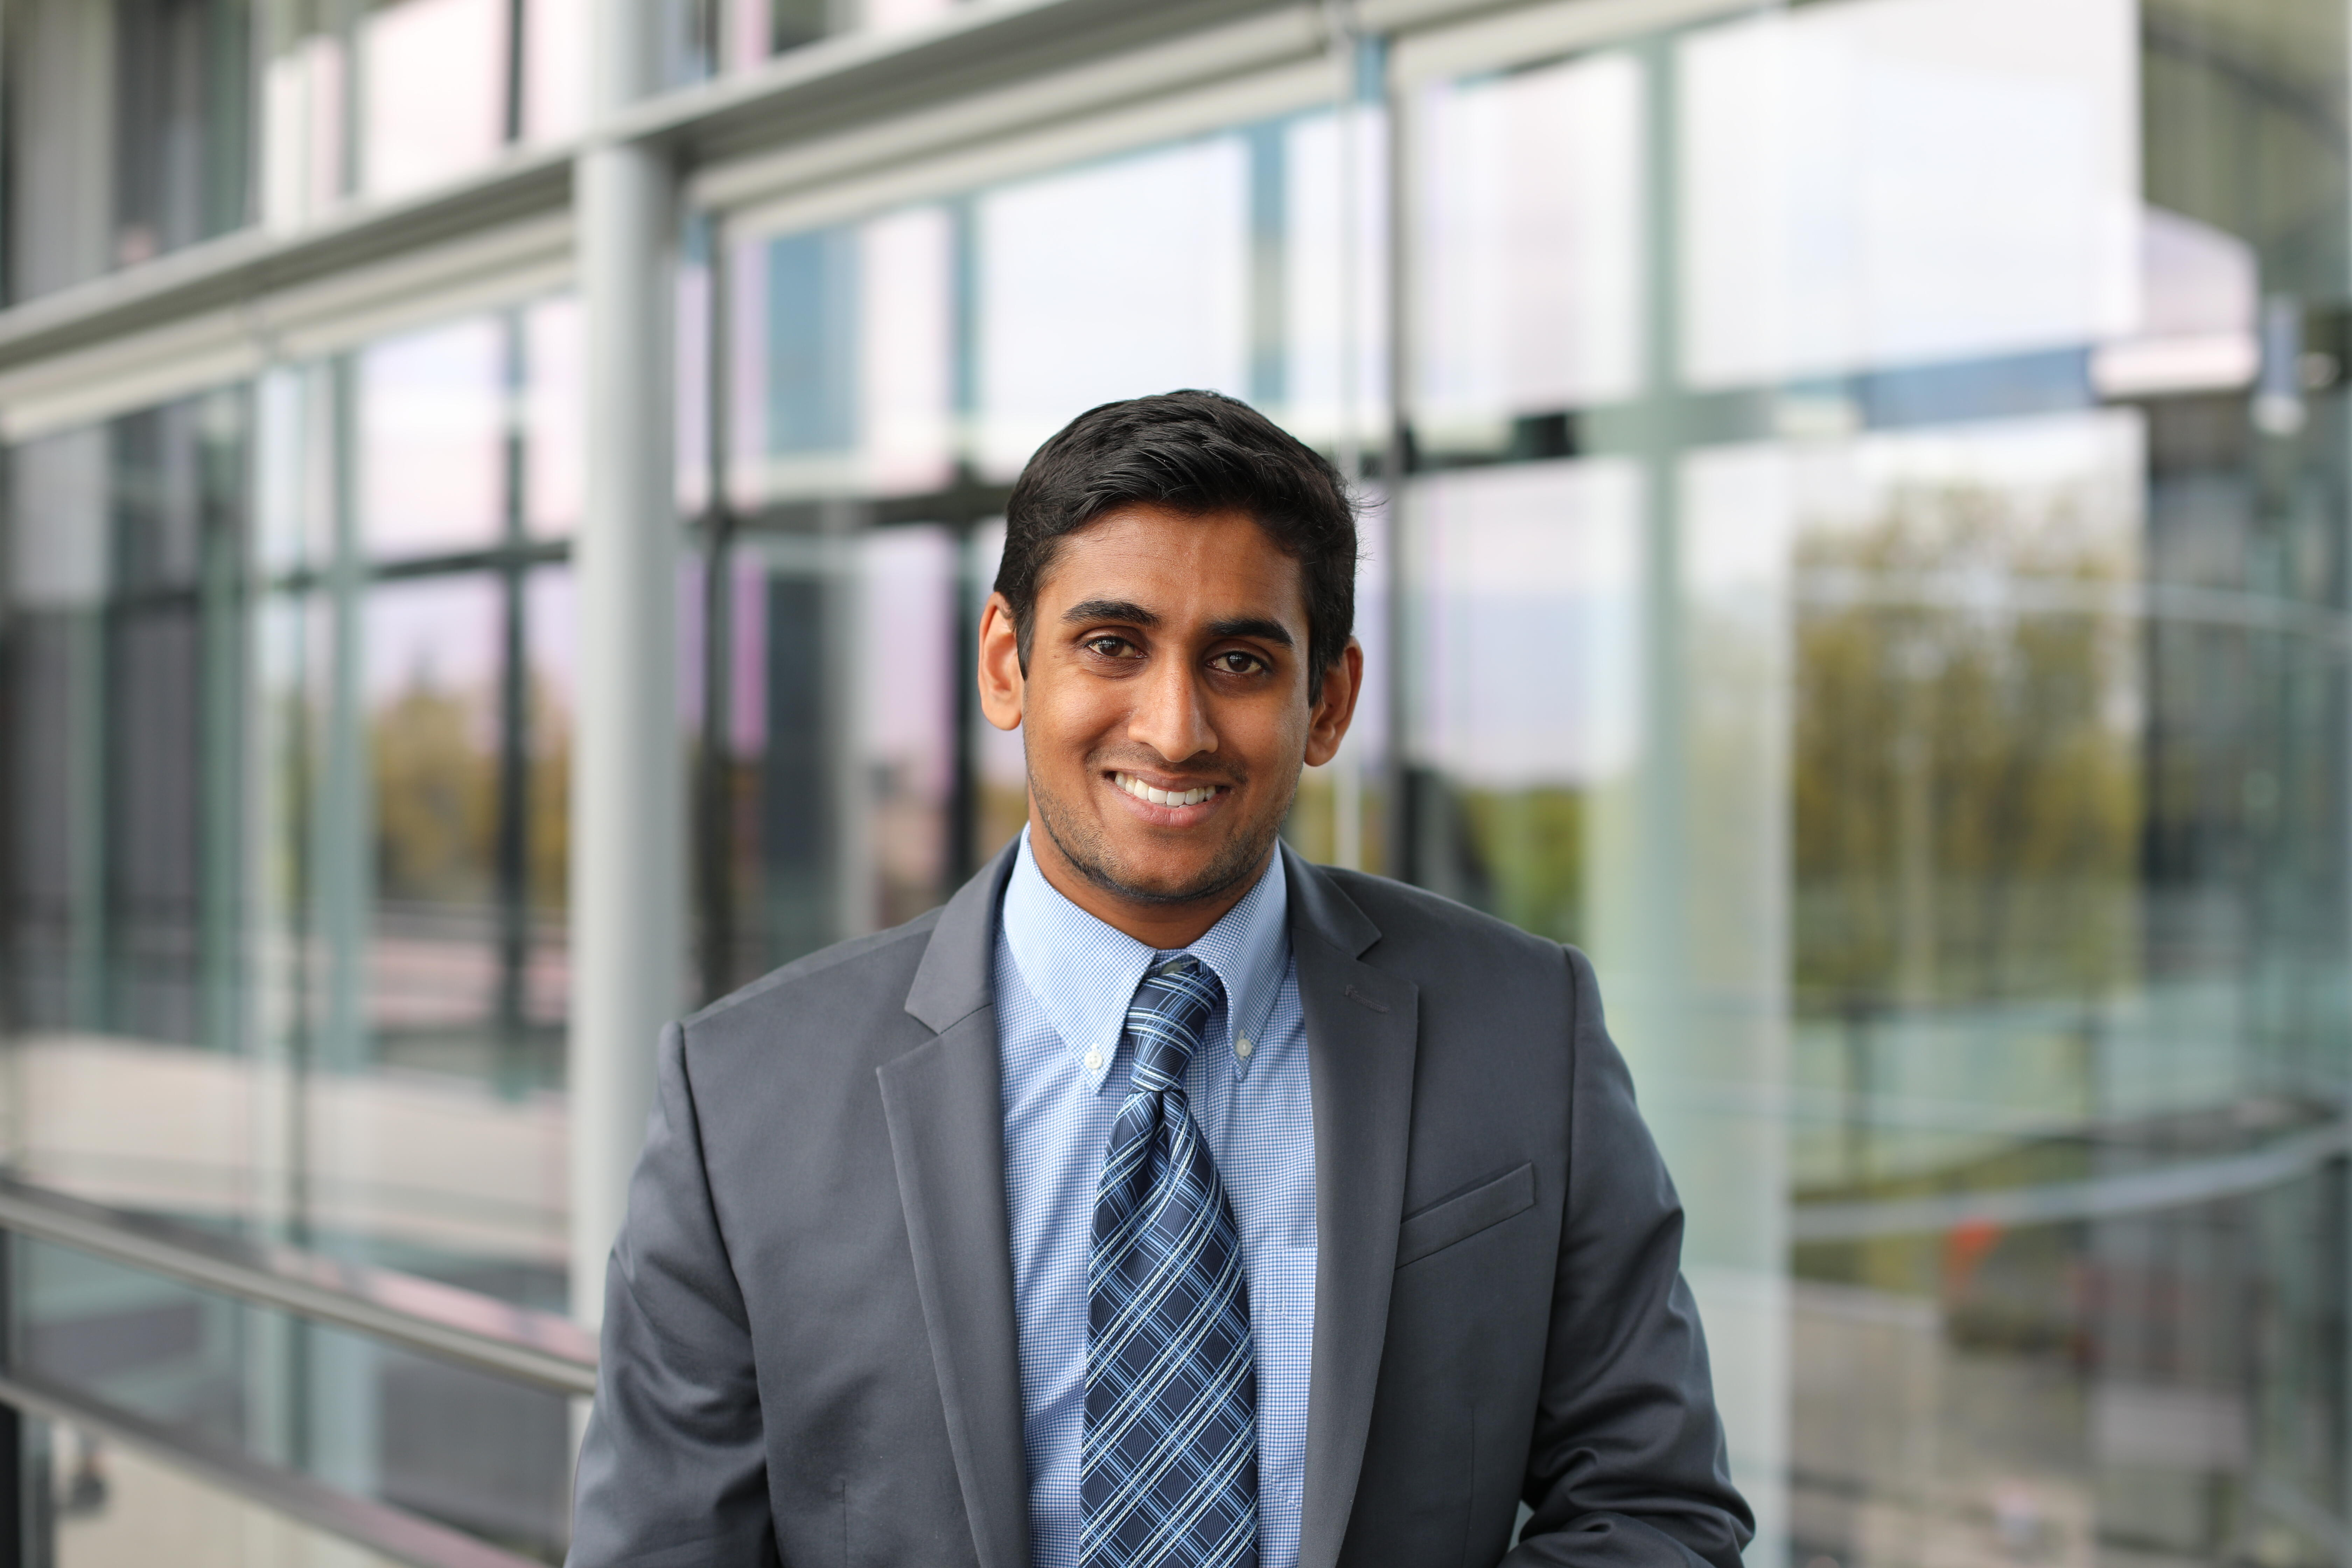 Tony Senanayake Yale SOM Class of 2020